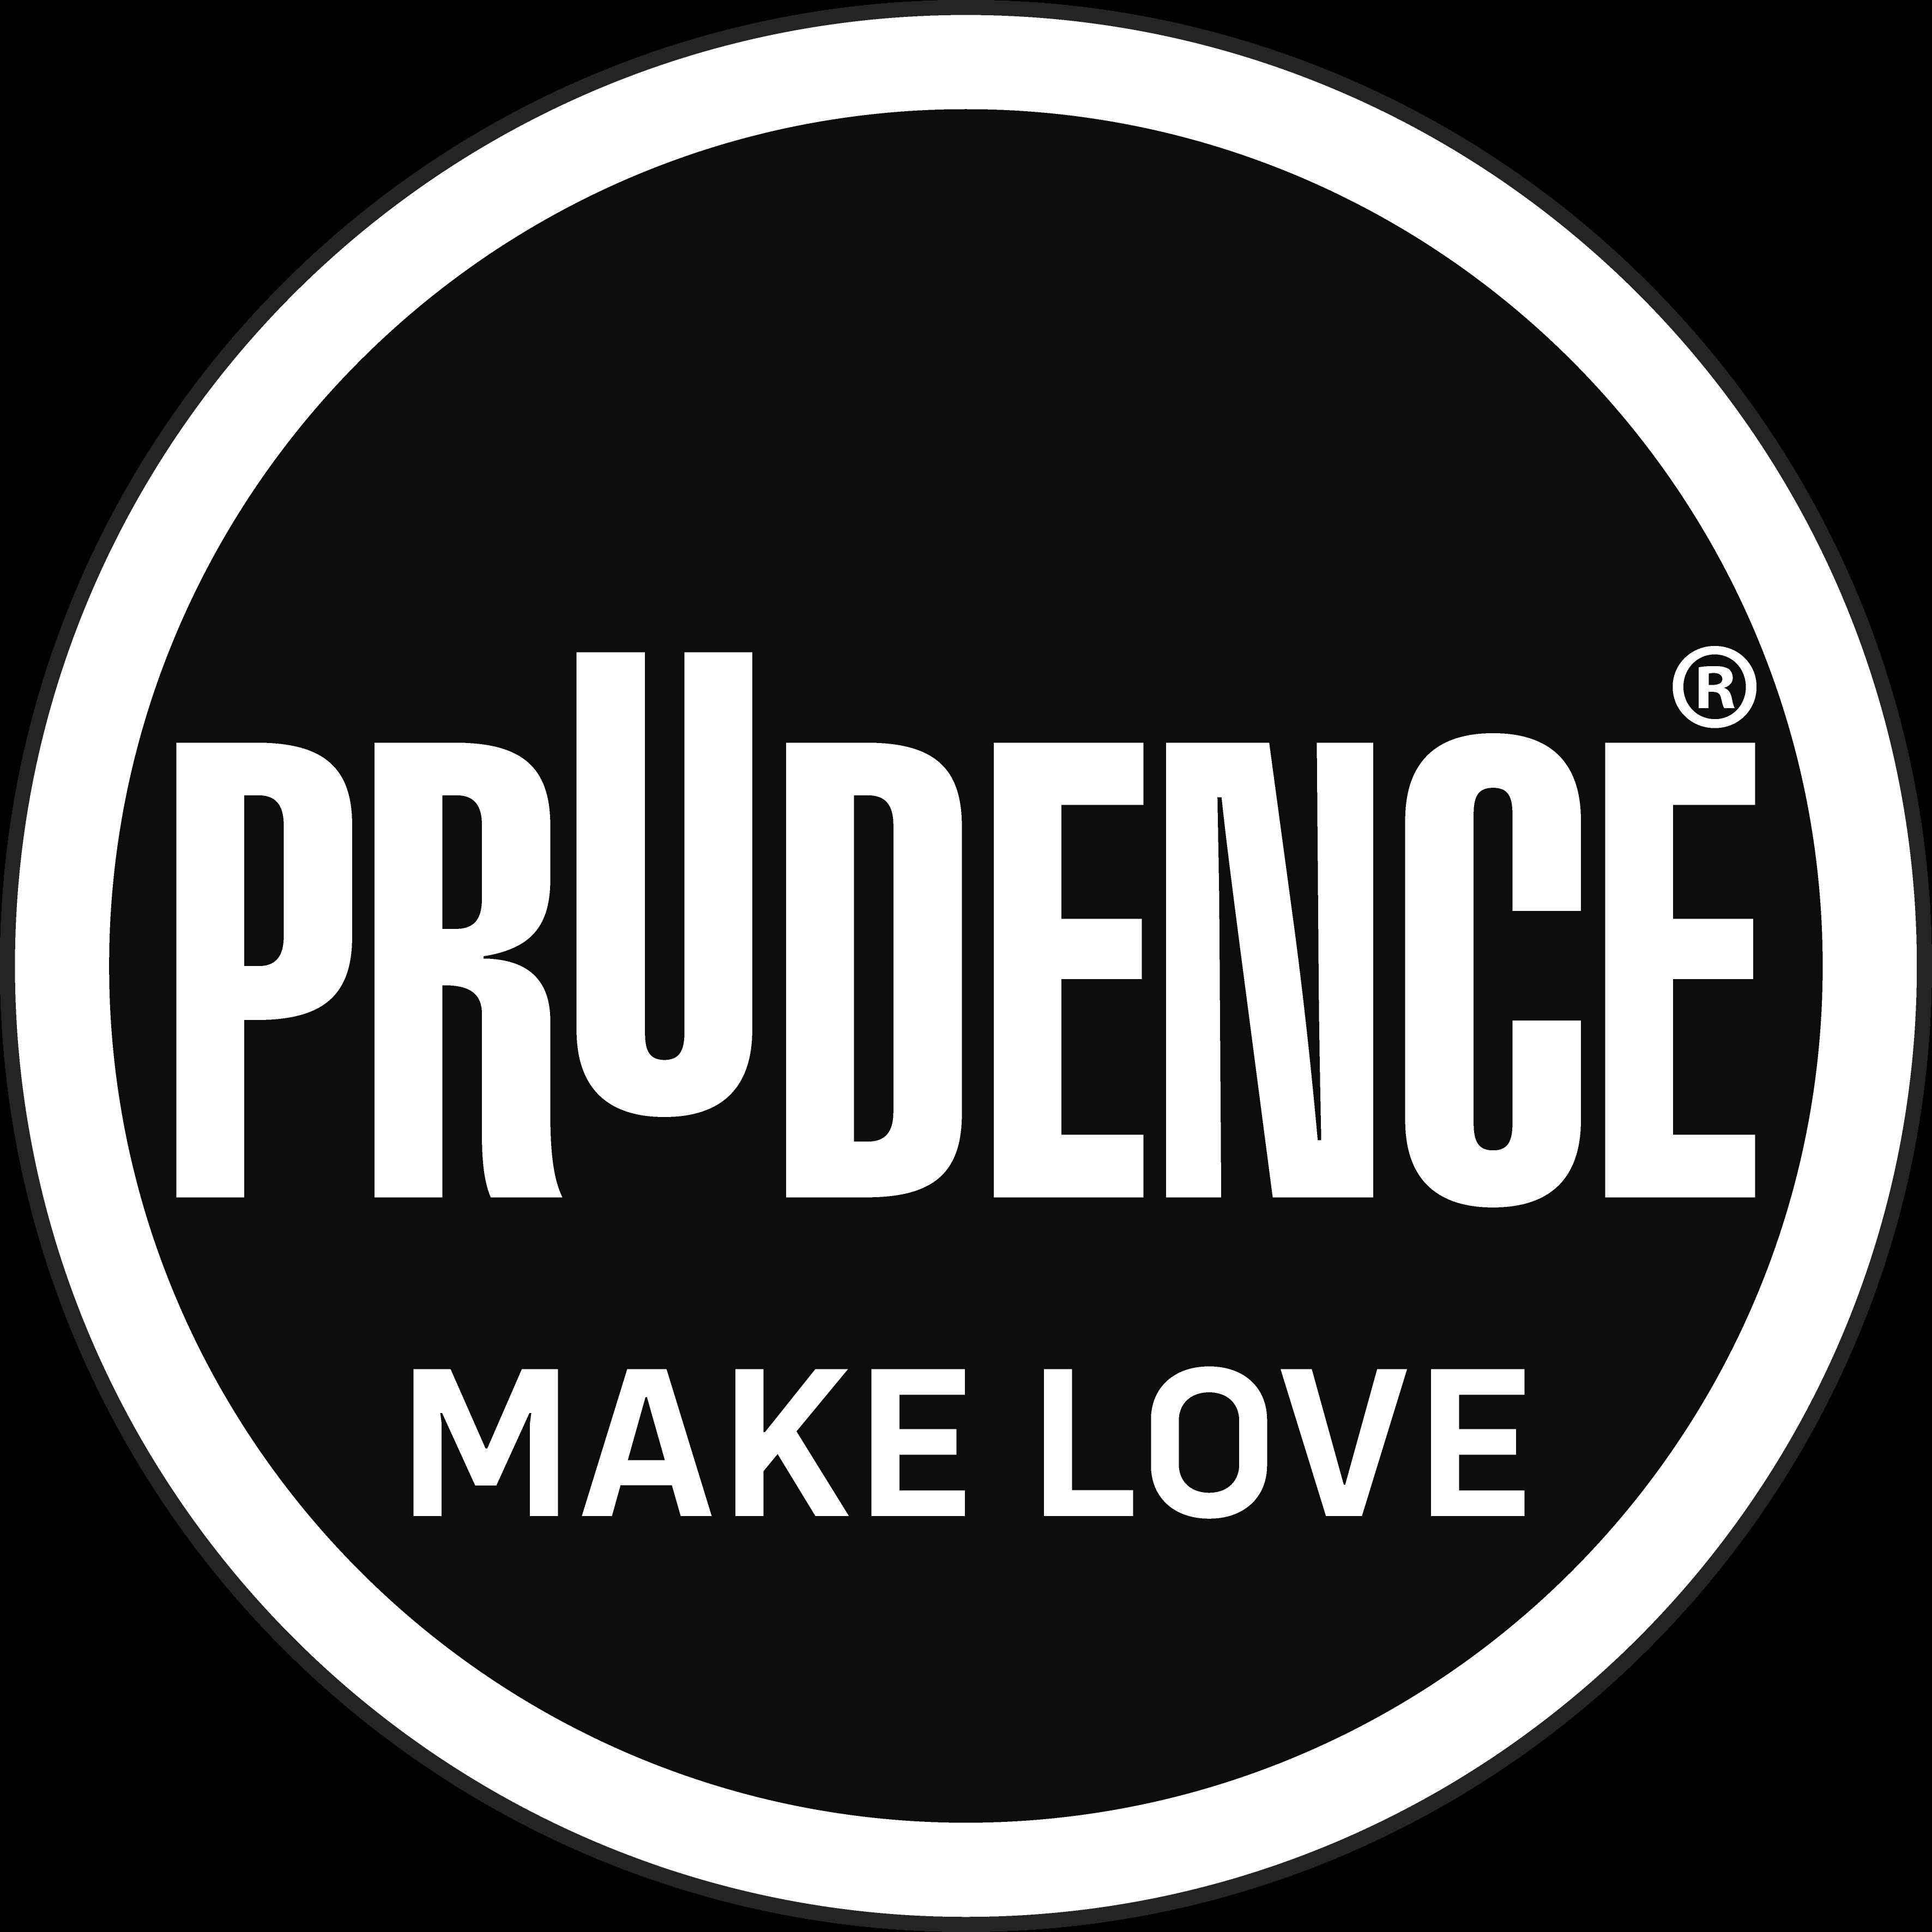 www.prudence.com.mx/